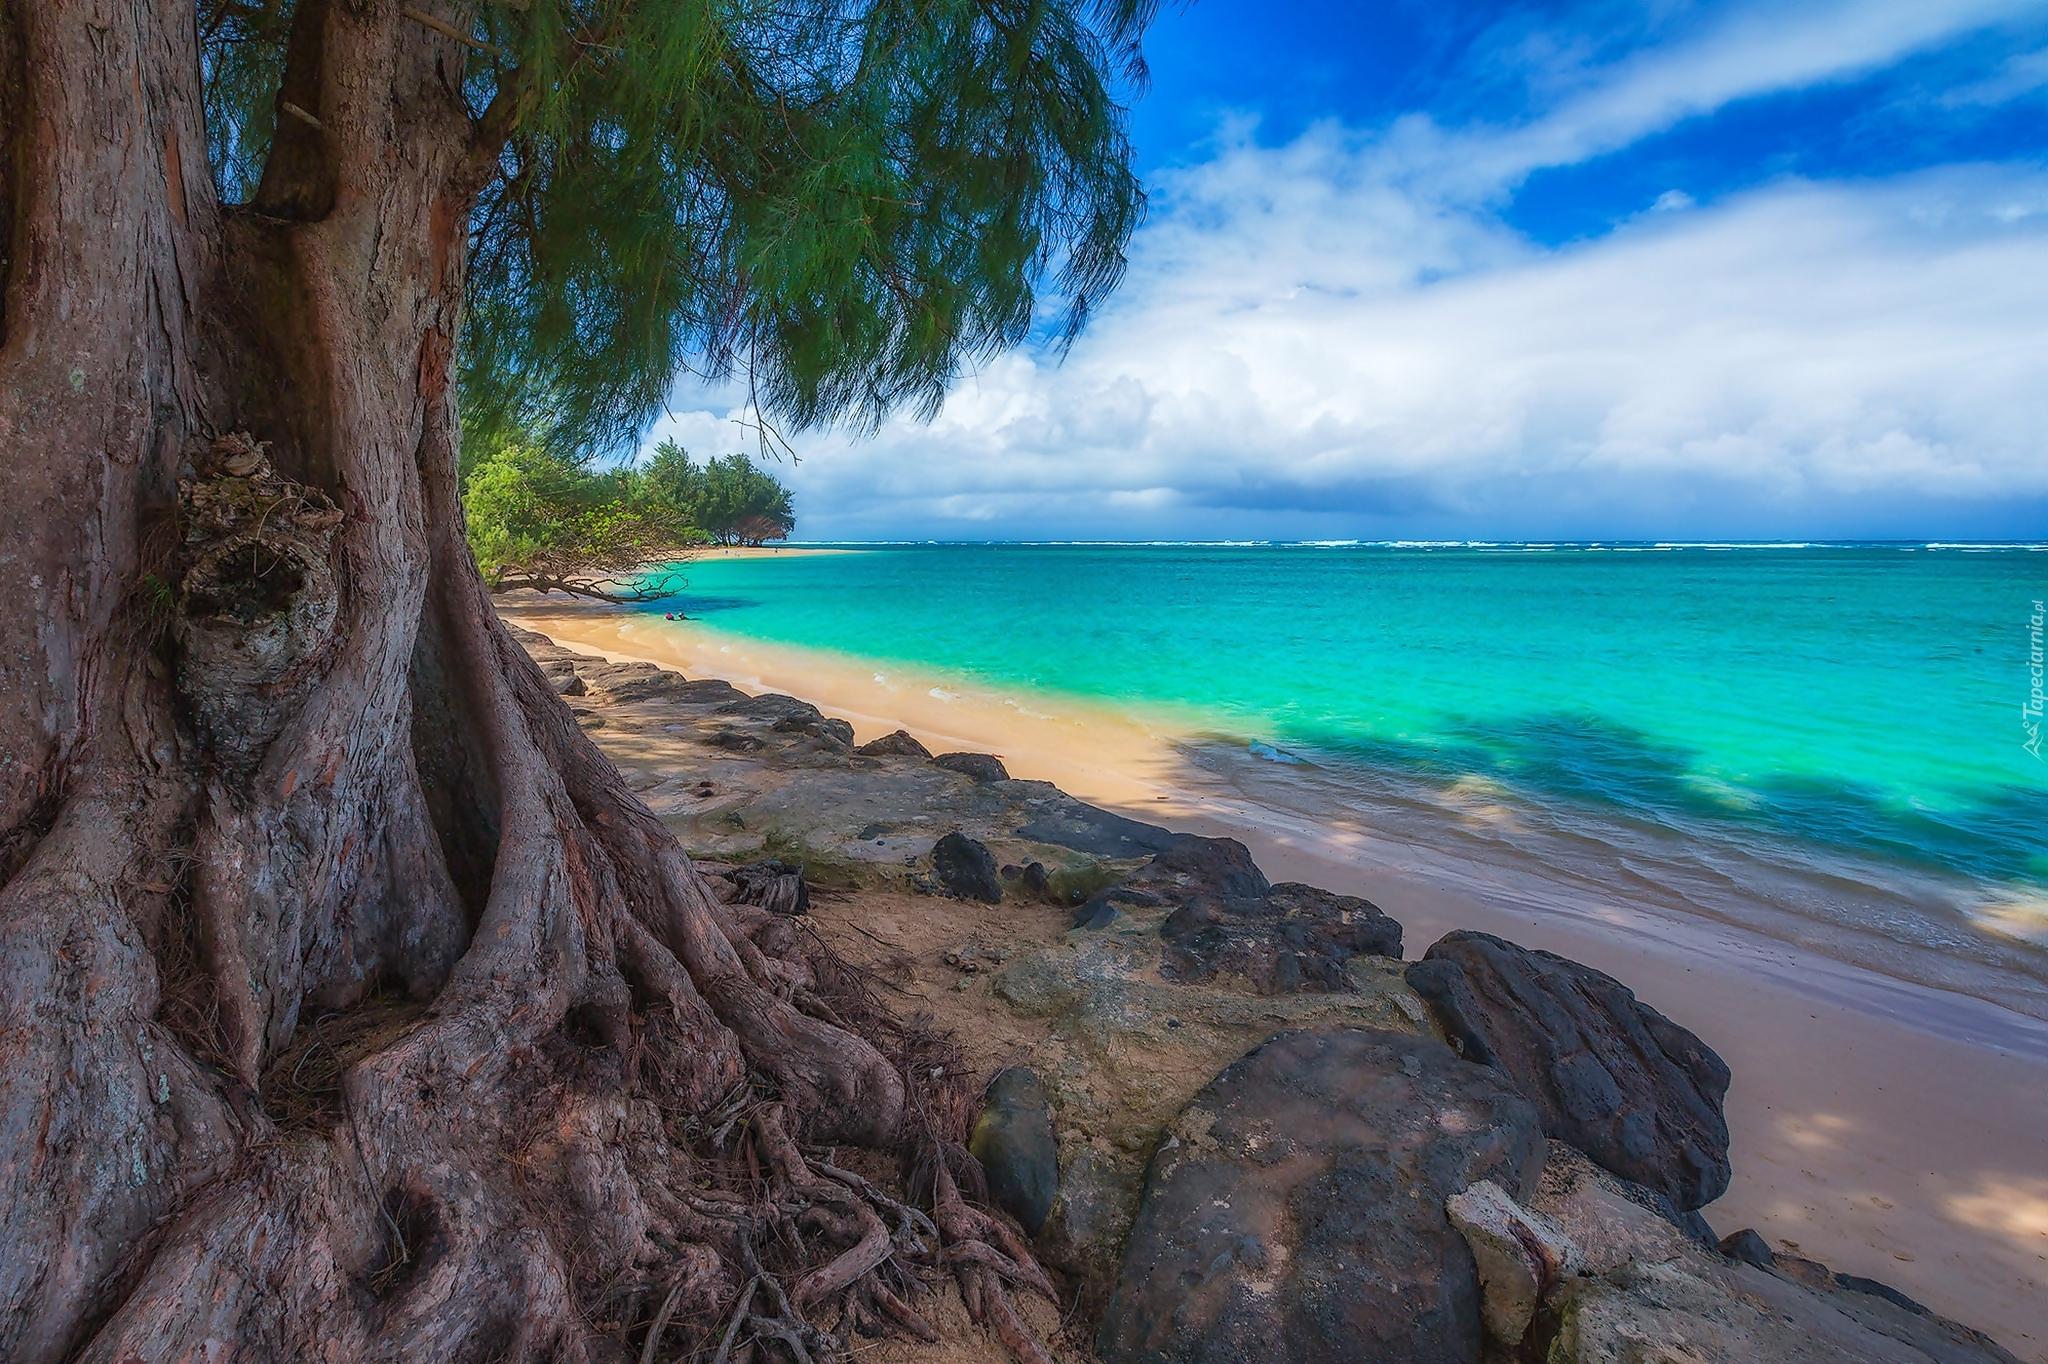 Kealia Shoreline, Kauai, Hawaii скачать